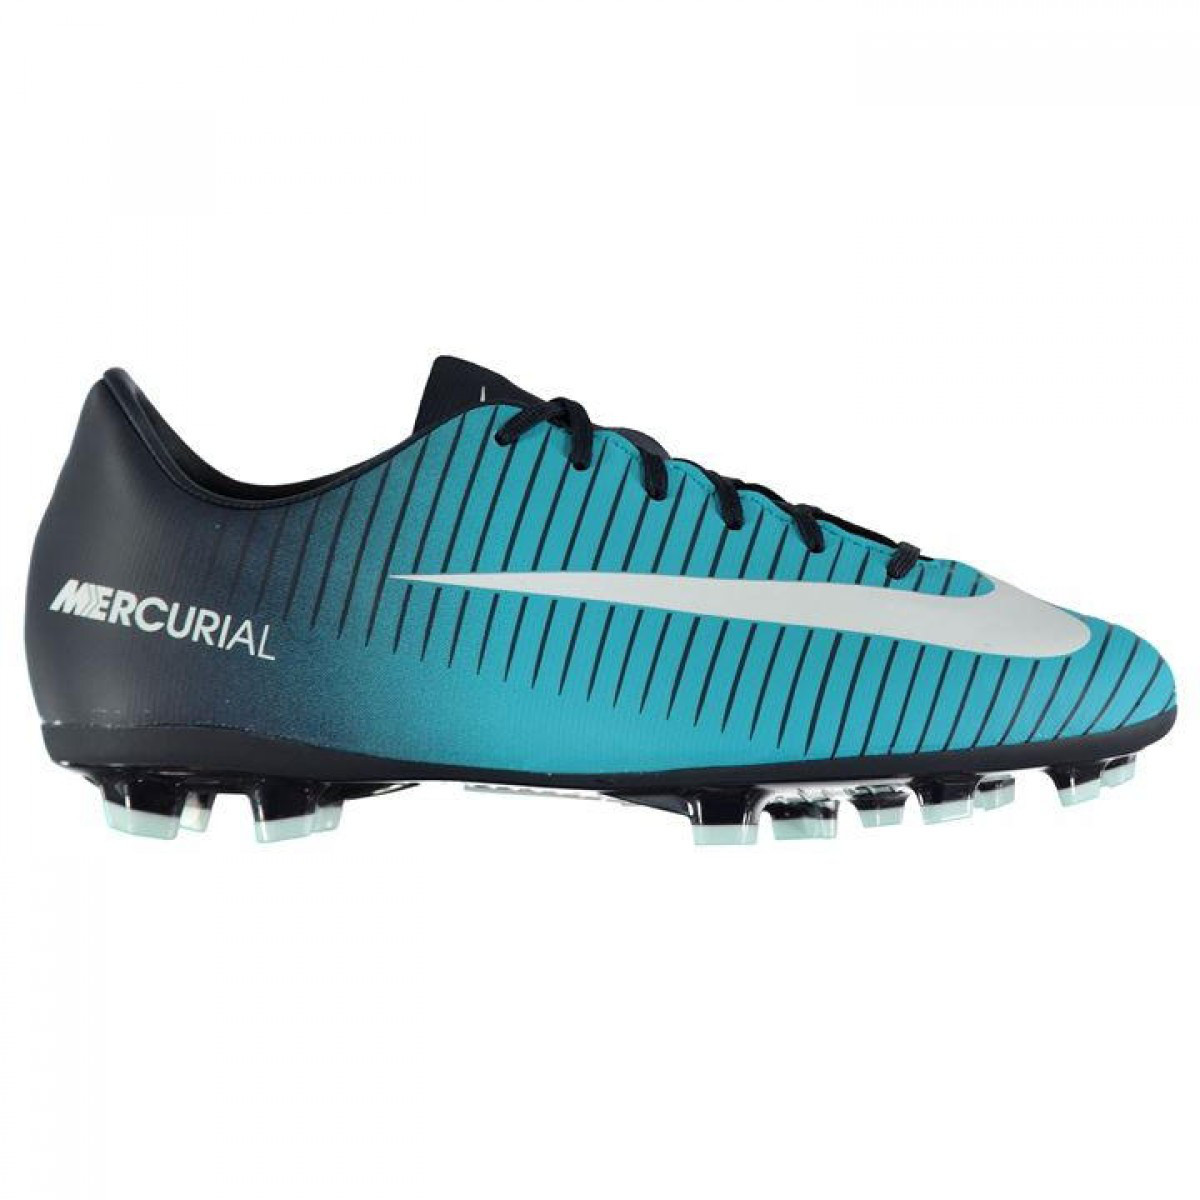 Купить фирменные Бутсы Nike Mercurial Victory Junior FG Navy White ... c0adcbac2d8b4